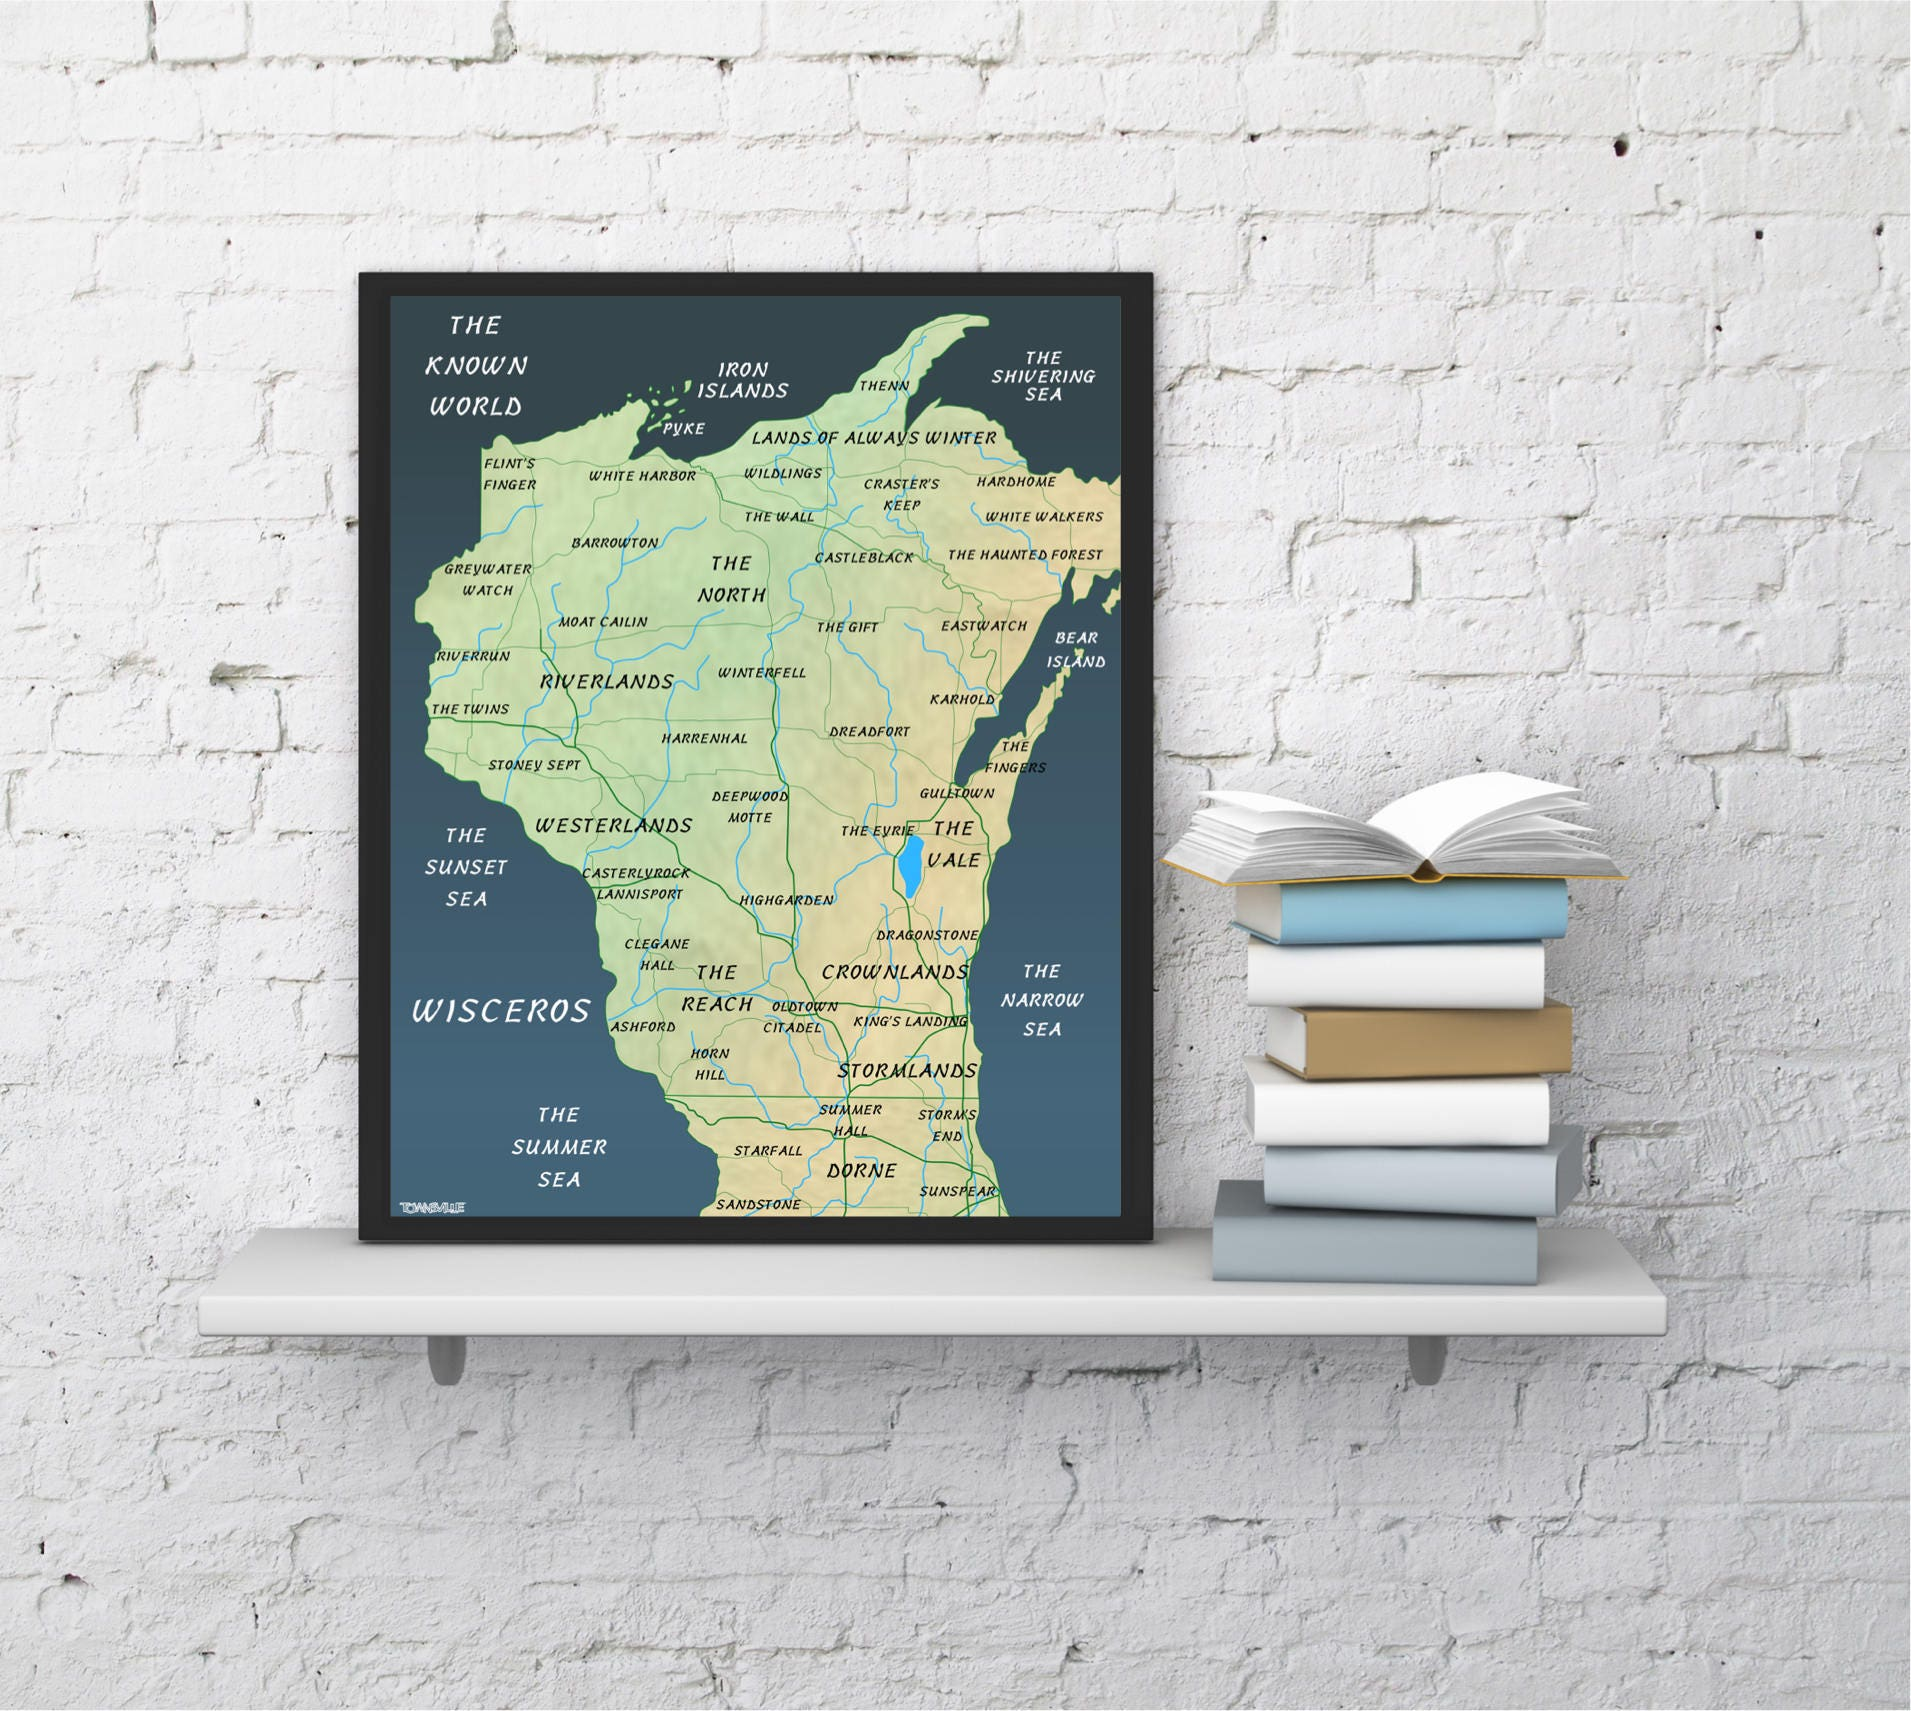 Game of Thrones Wisconsin Map Print King Wisconsin Map on king virginia map, wild rose wi map, king wisconsin veterans home, king wisconsin restaurants, king va waupaca in wisconsin,